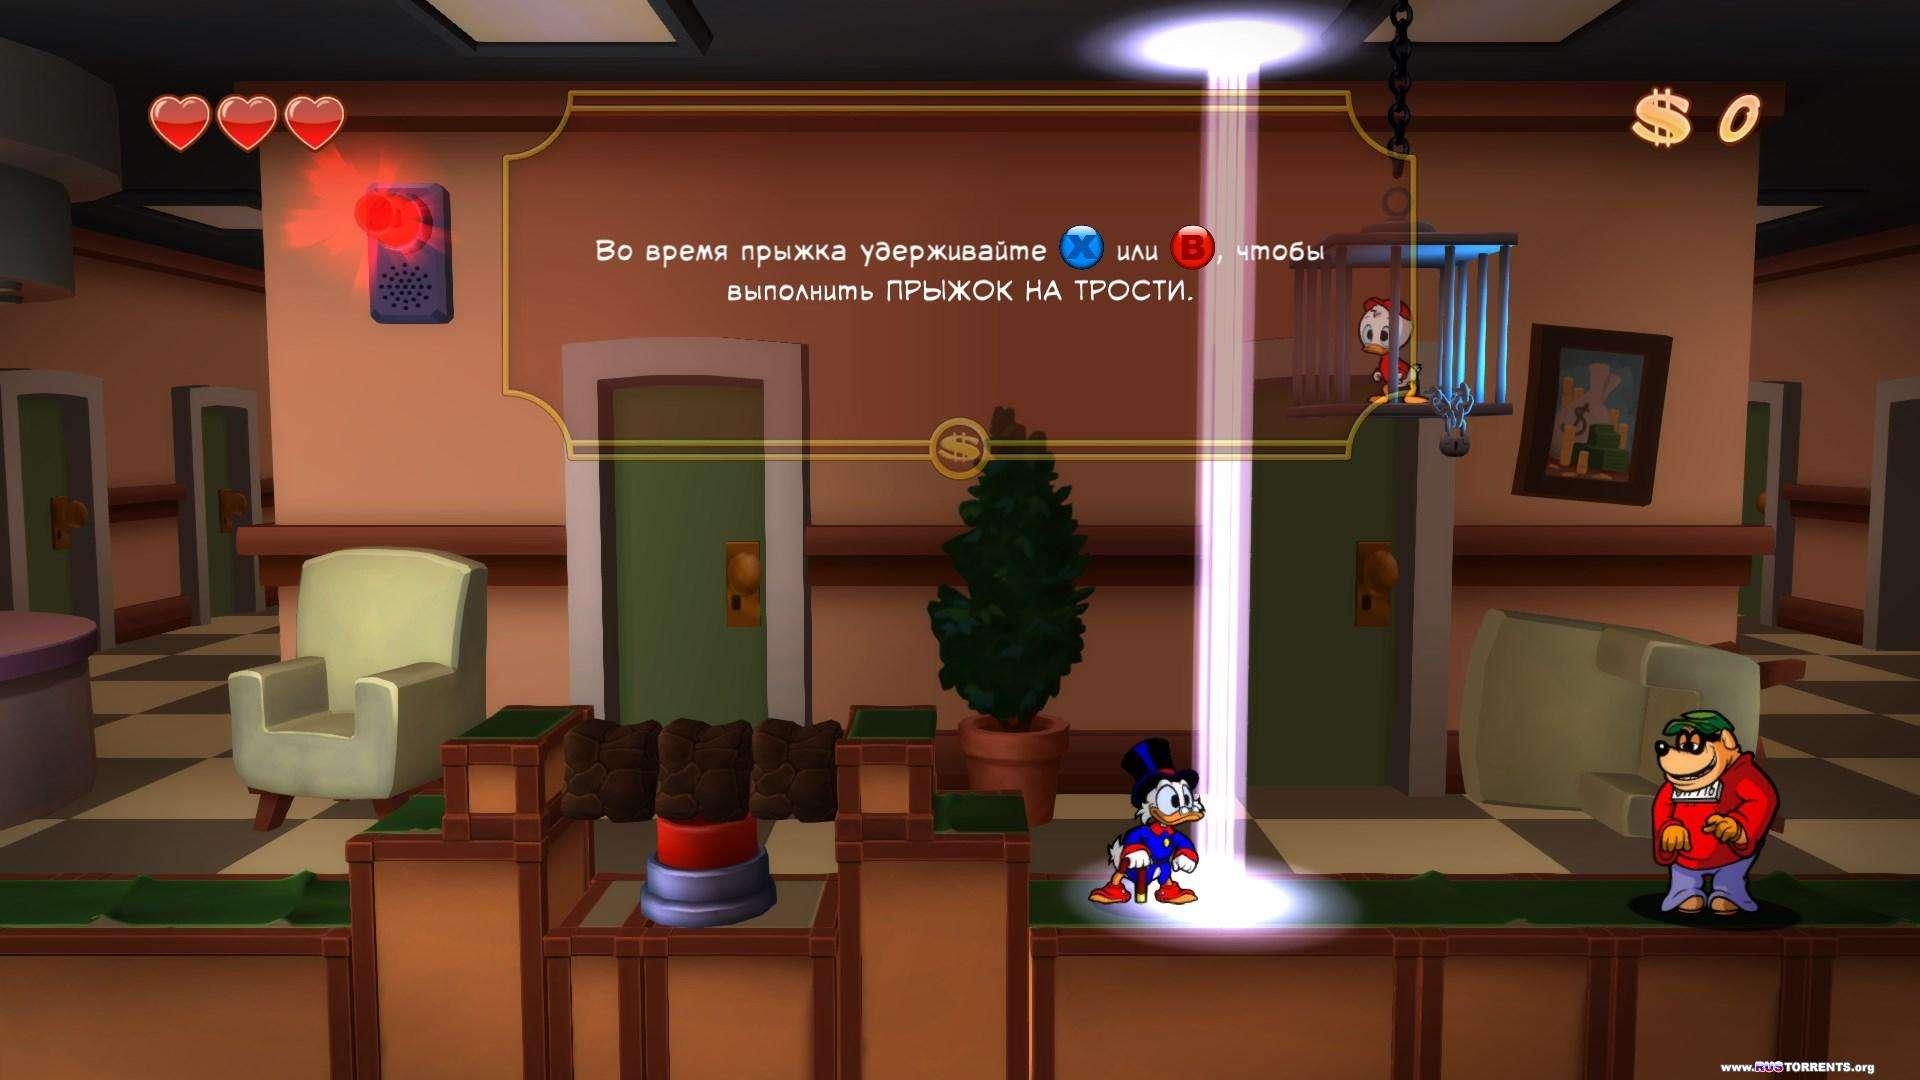 DuckTales Remastered | ����������� ������������ (�����) �� 25.09.